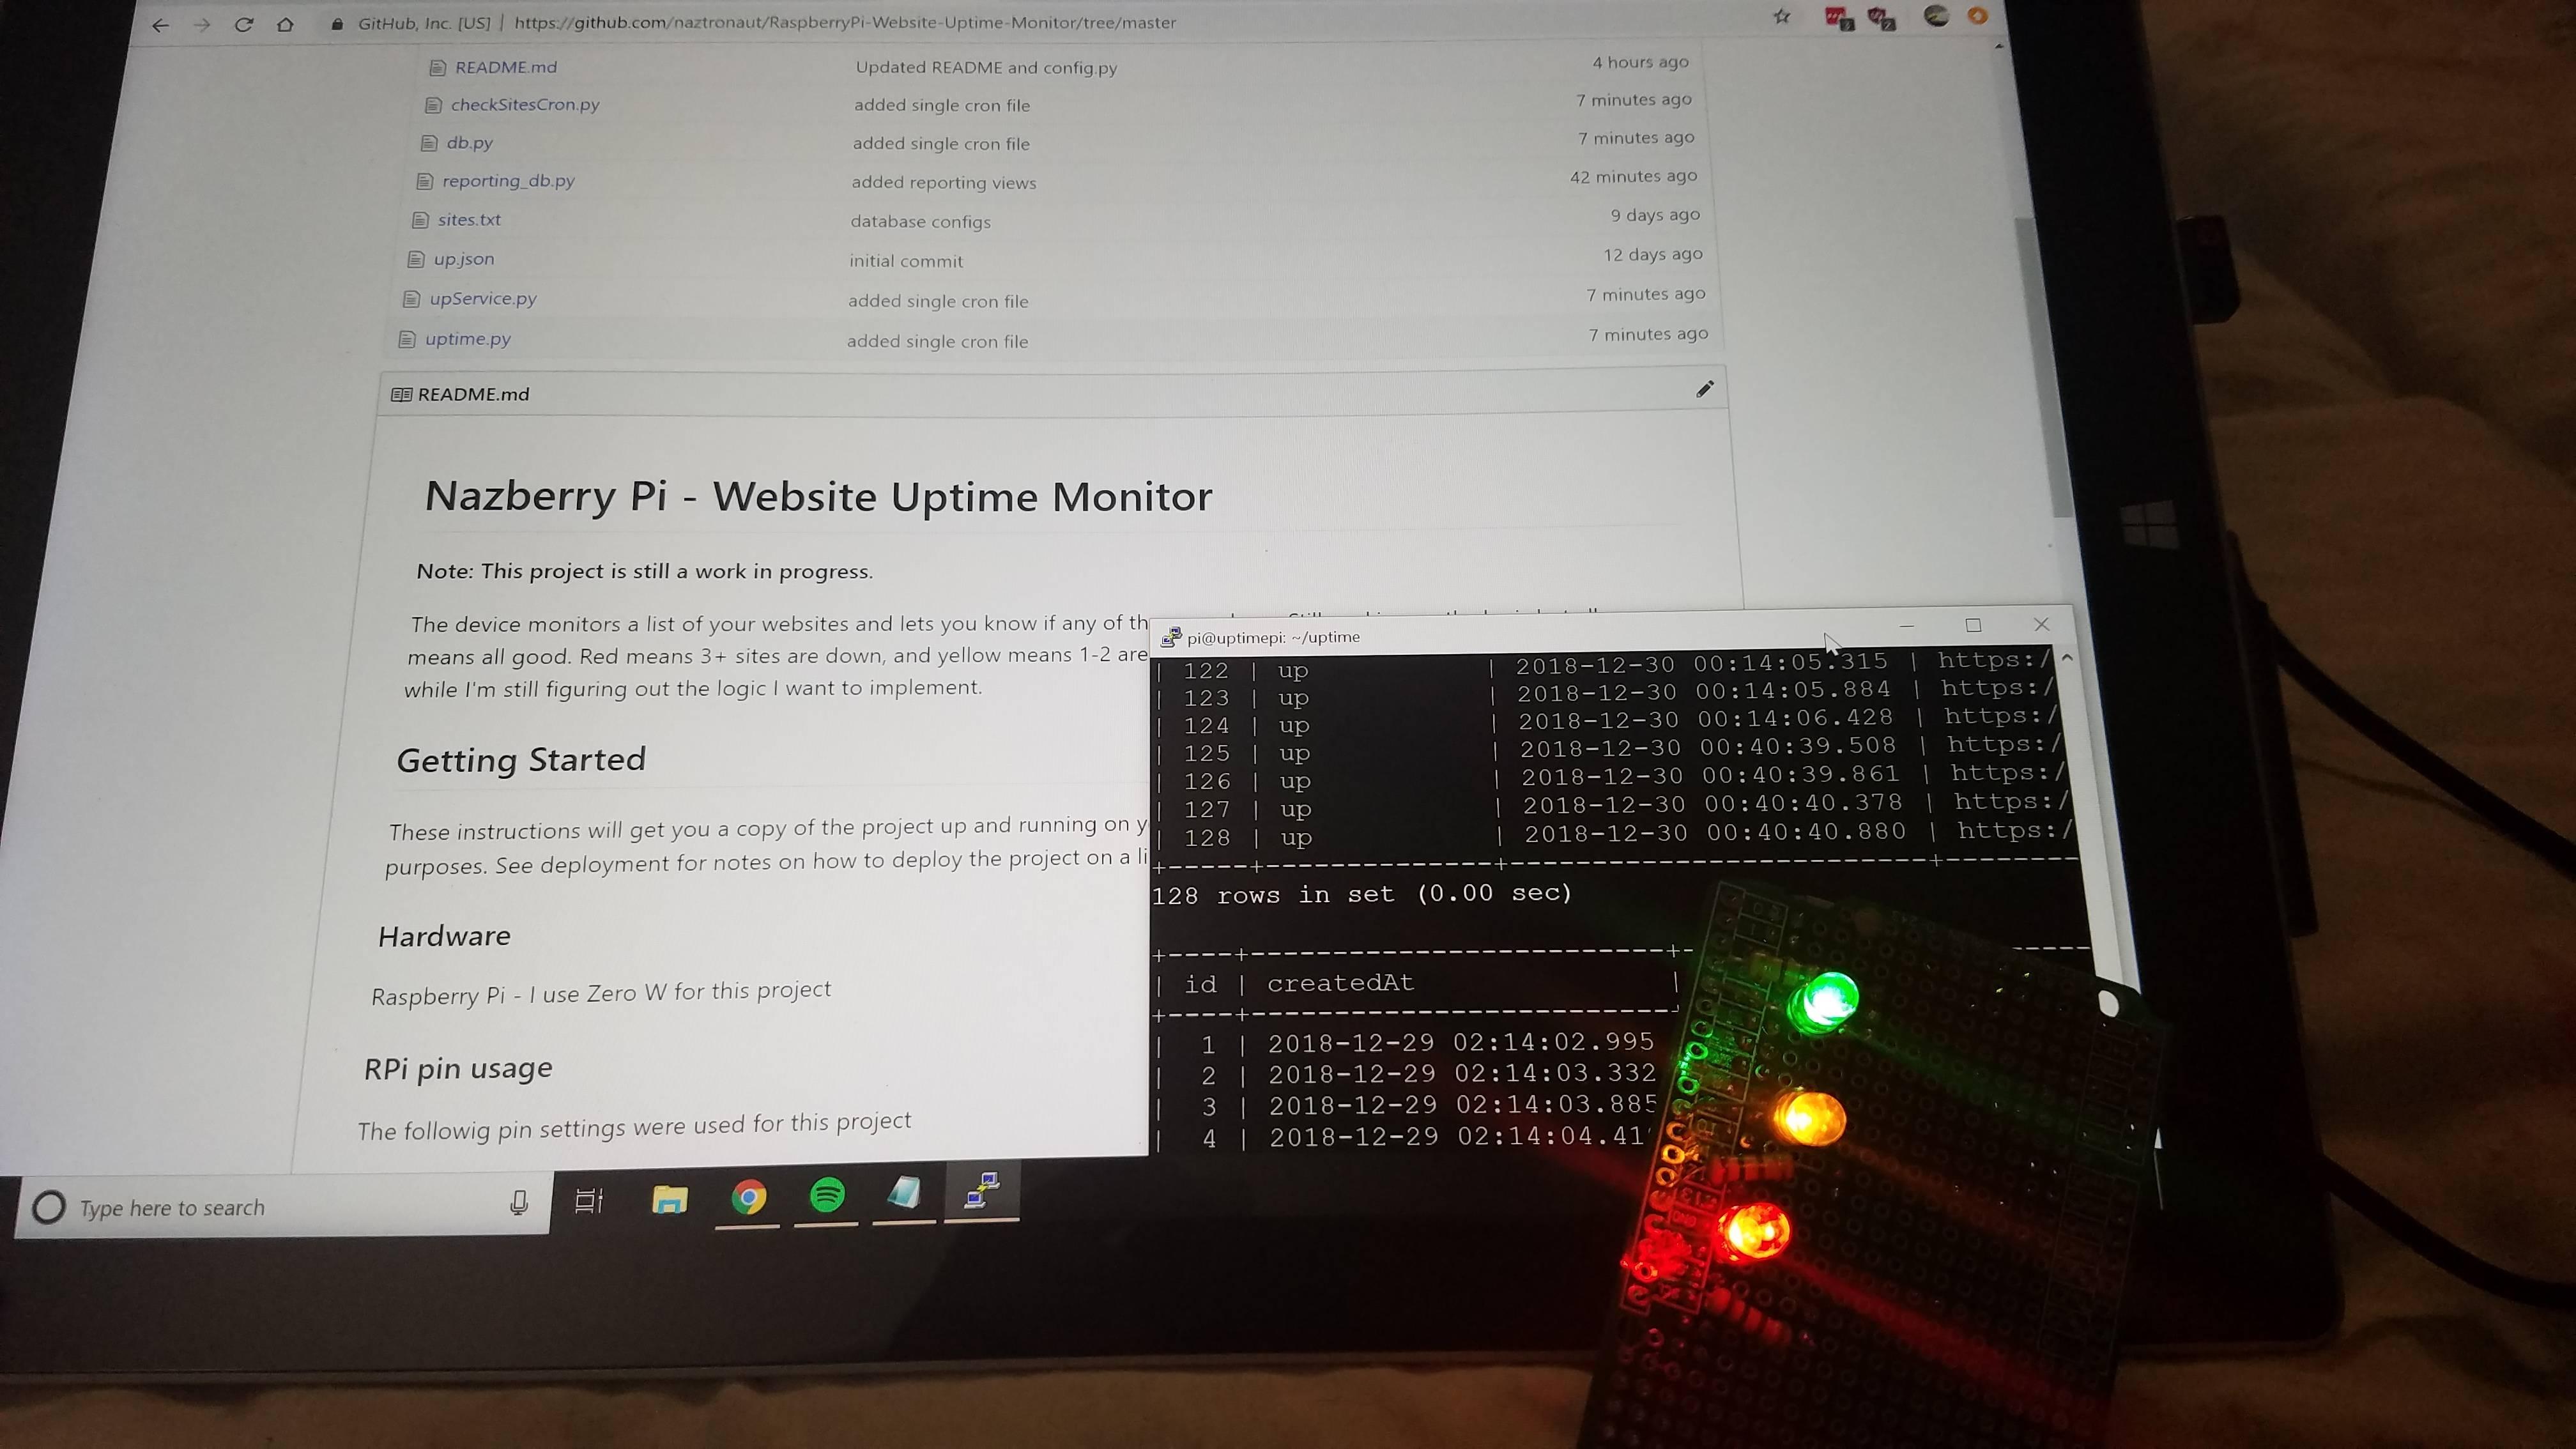 Website Uptime Monitor